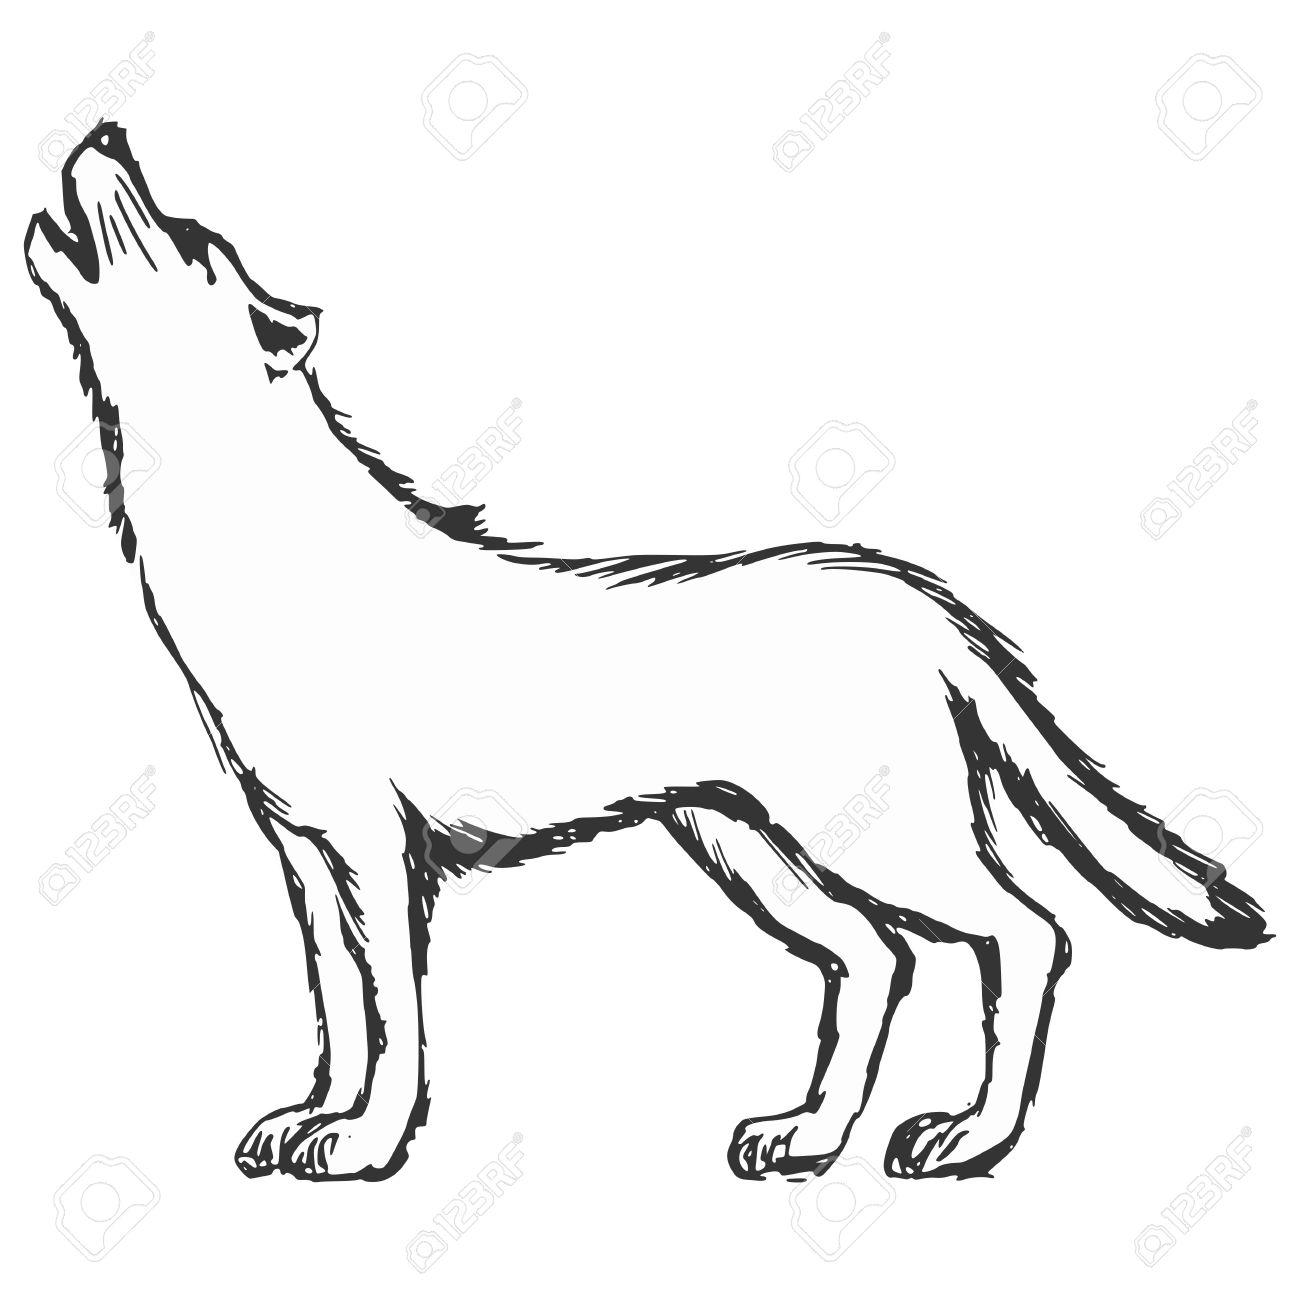 Hand Drawn, Sketch, Cartoon Illustration Of Wolf Royalty Free ...